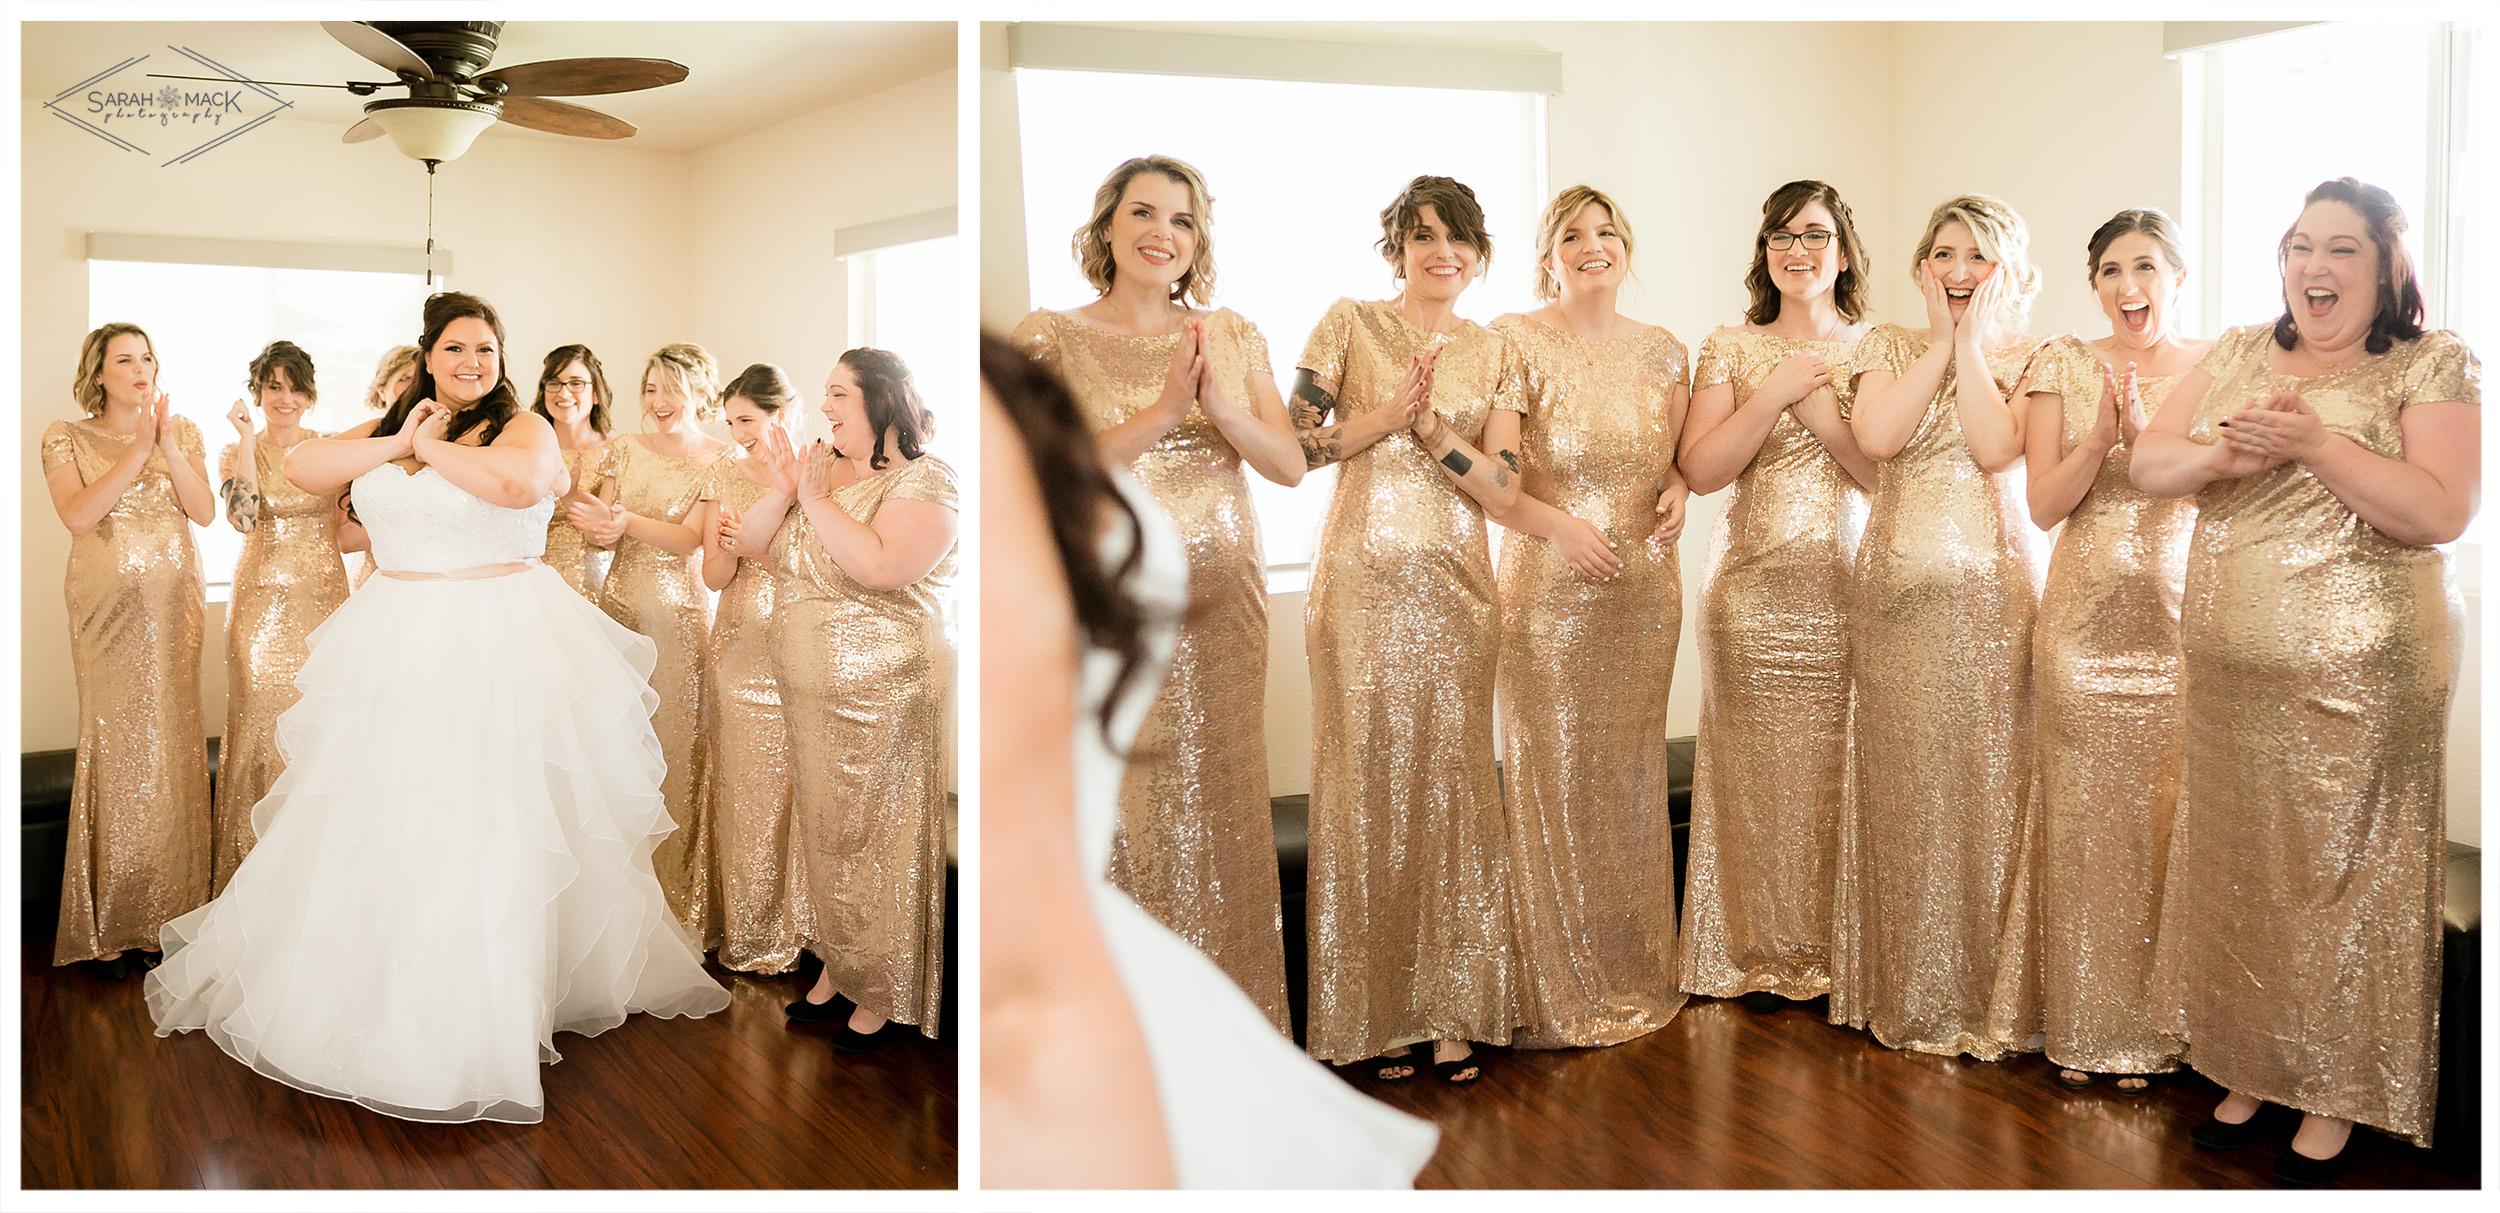 RF-Estate-on-Second-Santa-Ana-Wedding-Photography-5.jpg